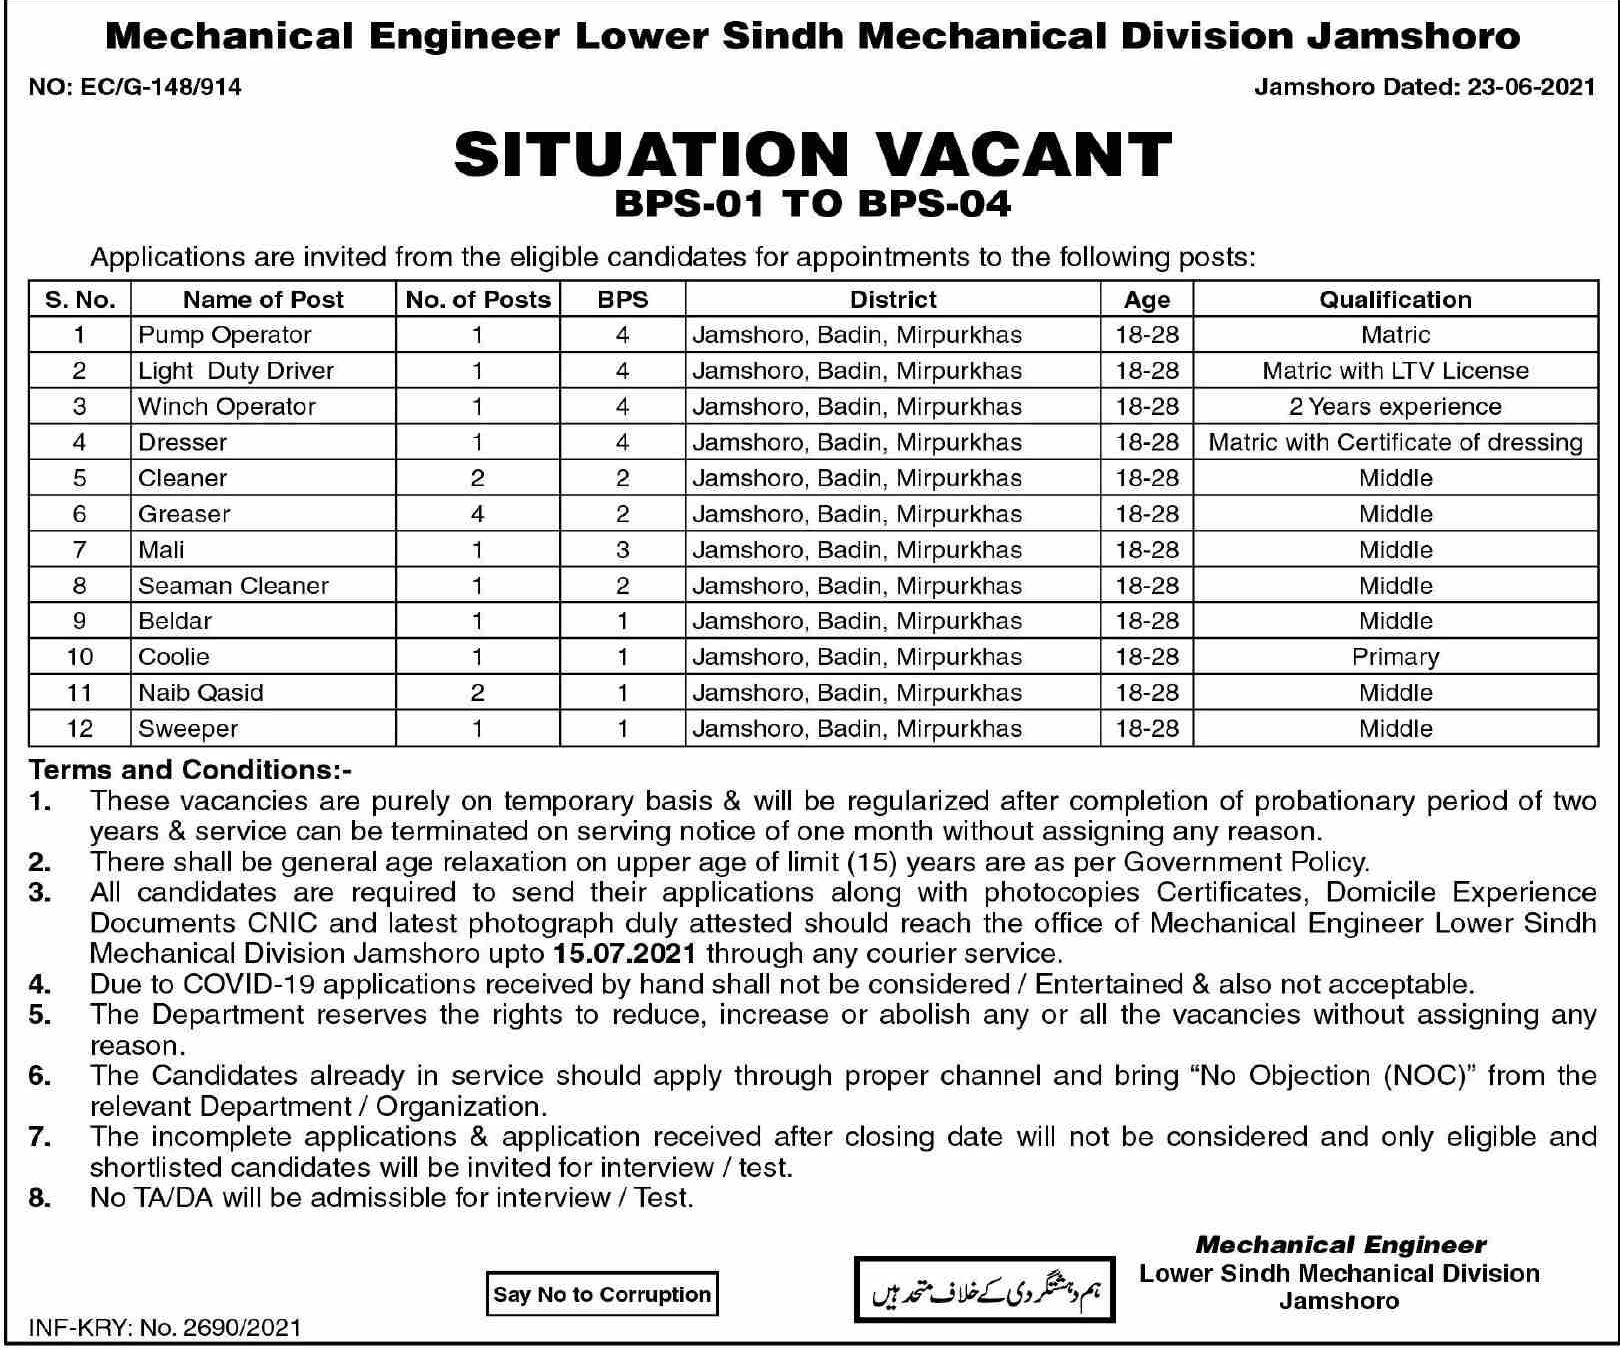 Mechanical Engineer Lower Sindh Mechanical Division Jamshoro Vacancies 2021 3